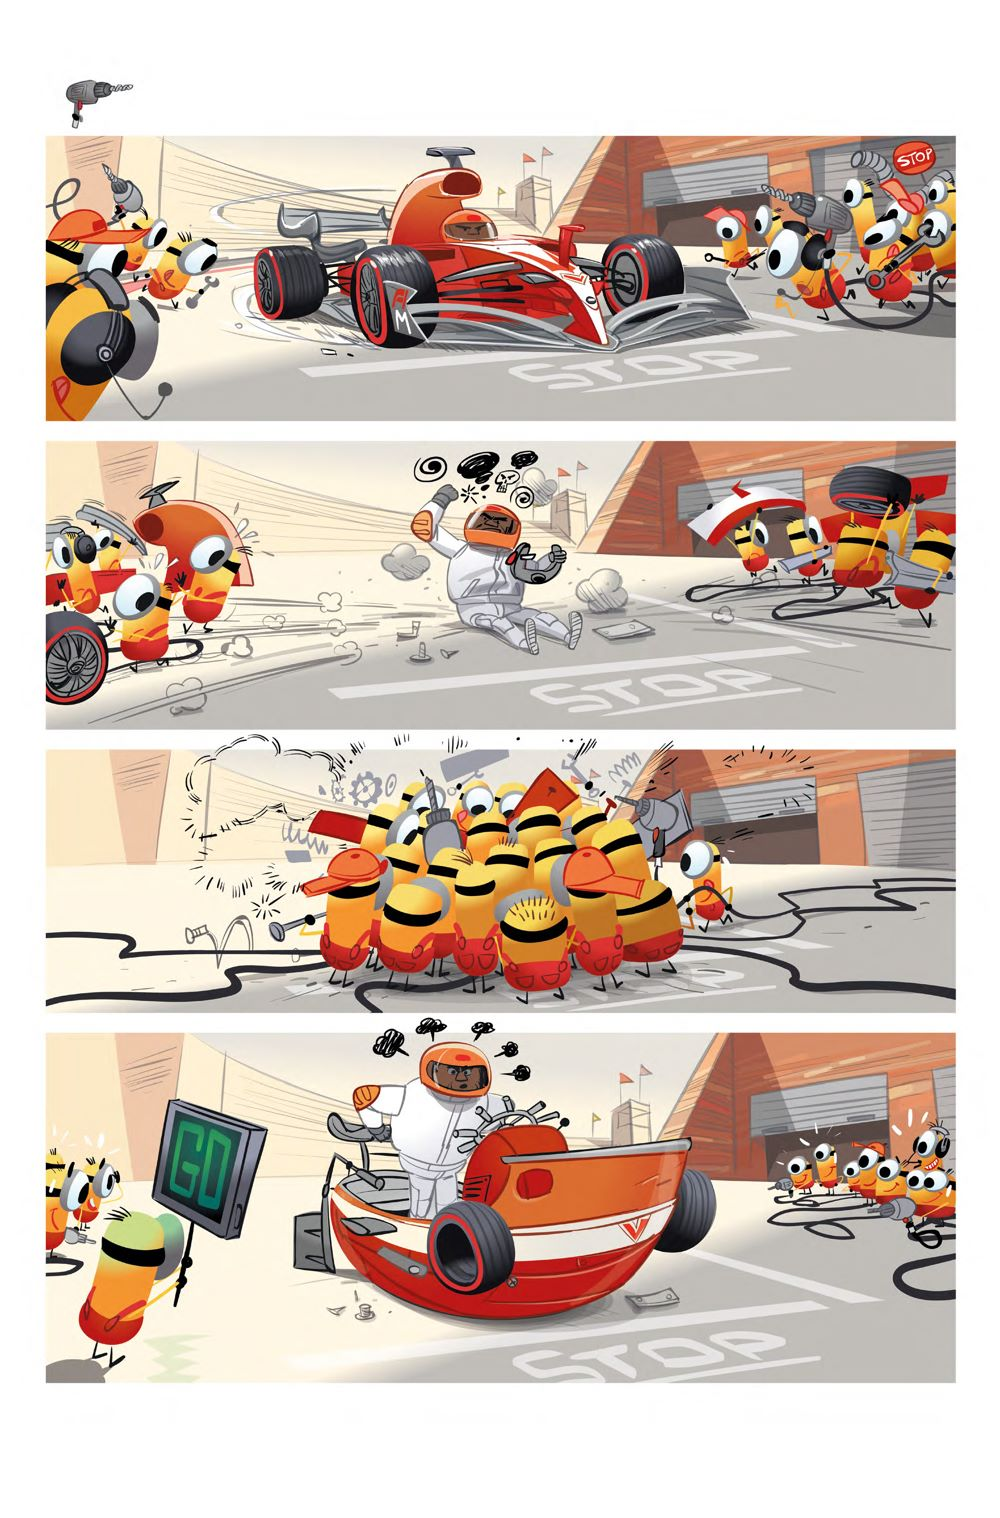 Interiors-Minions-Sports-1-Full-PDF-2_Page_3 ComicList Previews: MINIONS VOLUME 5 SPORTS #1